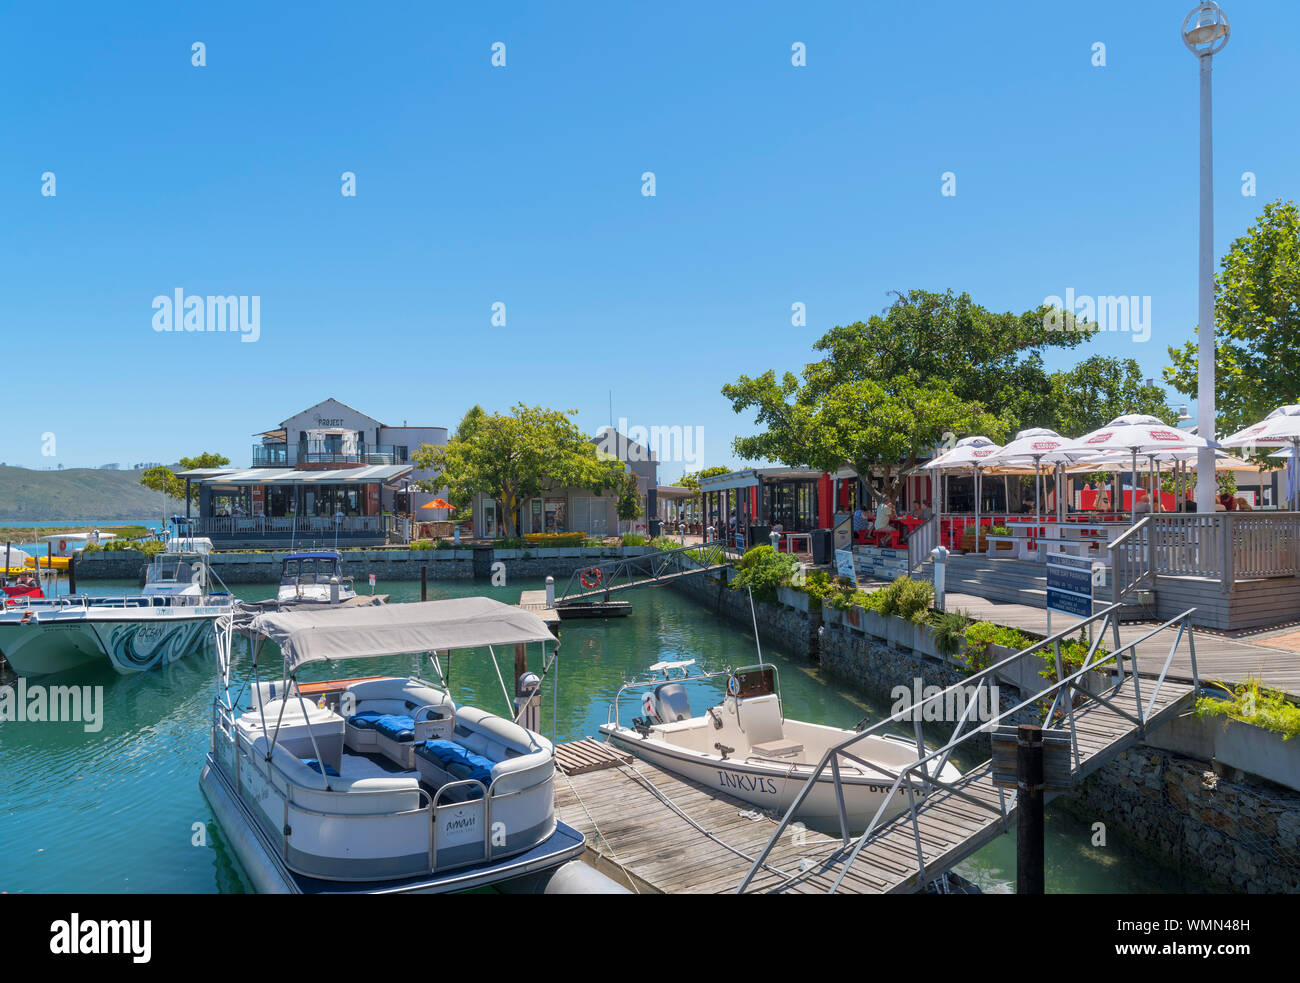 Restaurants in the marina on Thesen Island, Knysna, Garden Route, Western Cape, South Africa Stock Photo